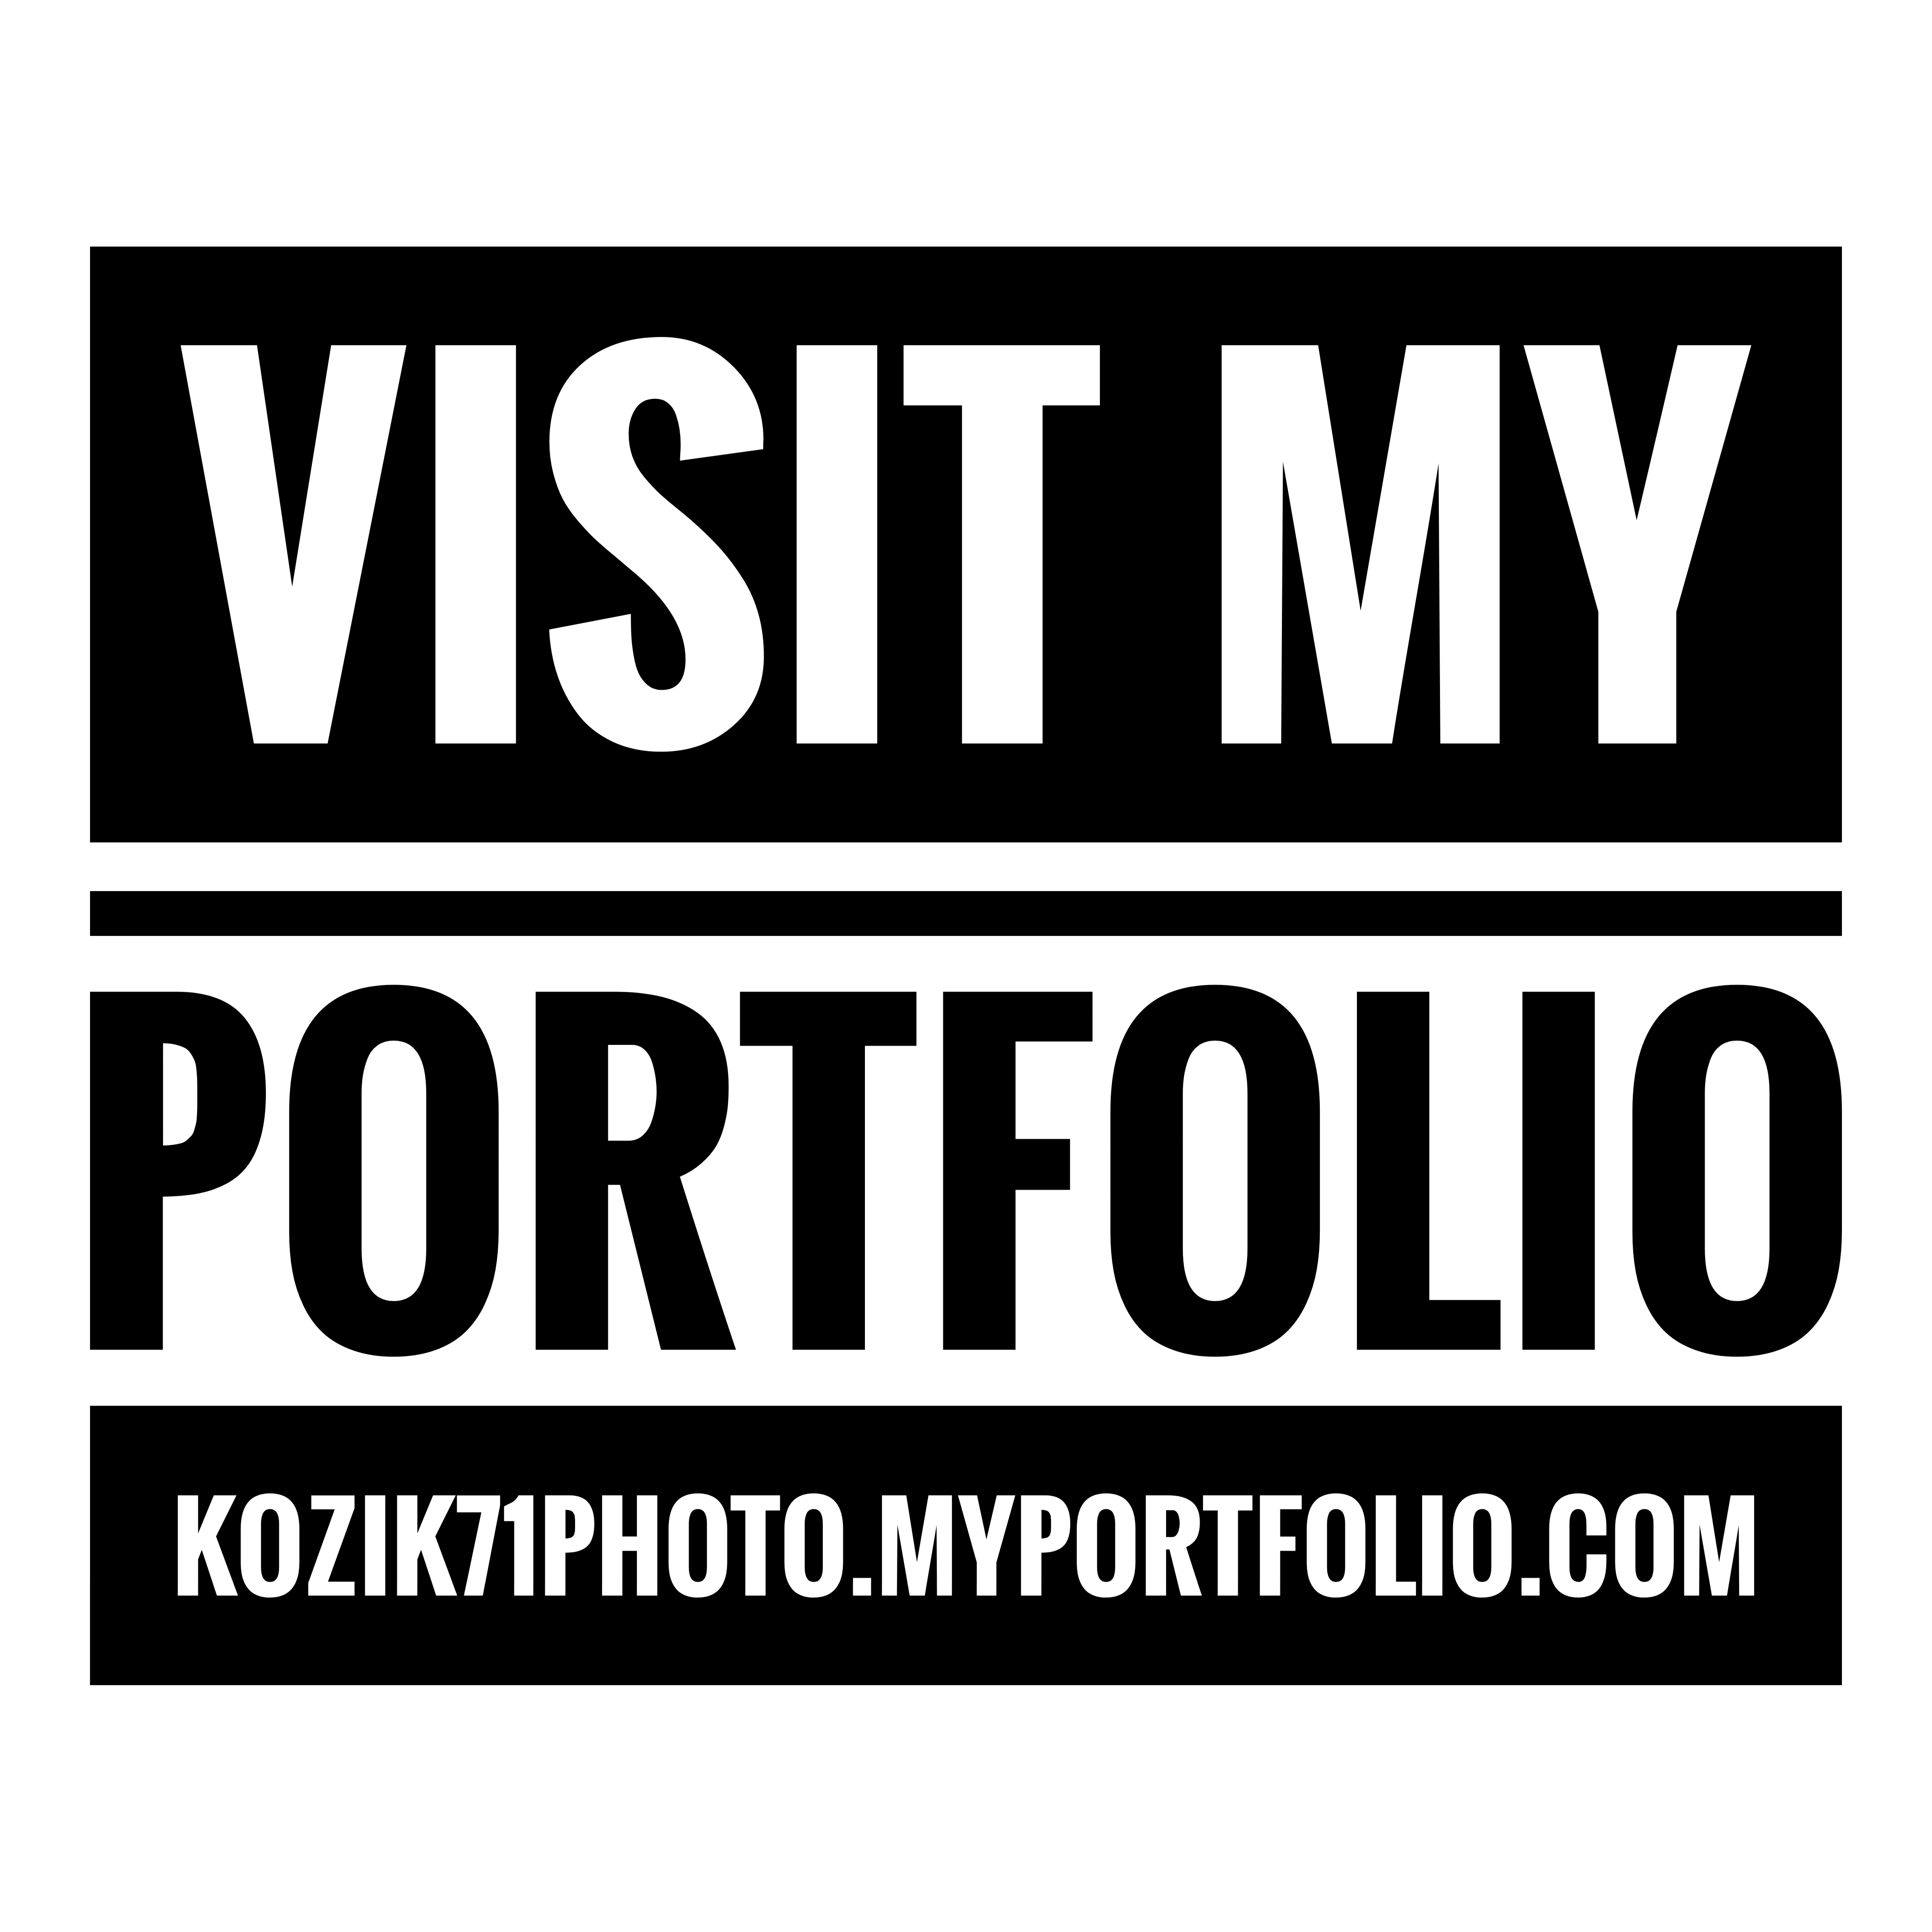 CELINE BUSOLINI - KOZIK 71 - Artiste Photographe